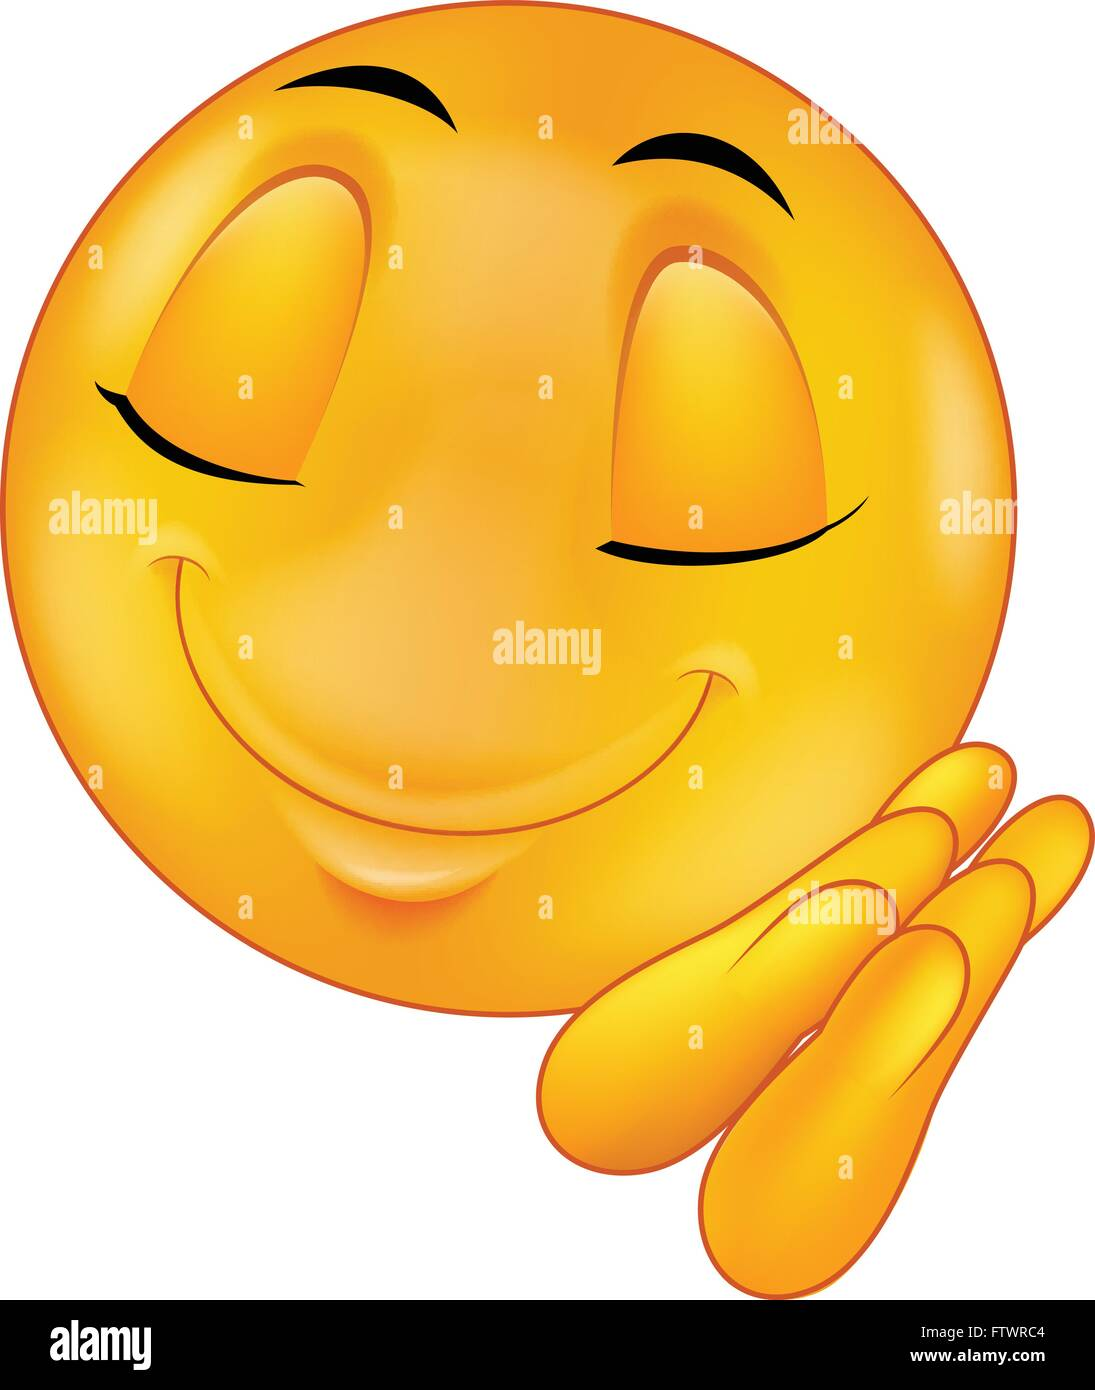 Schlaf Smiley Emoticon Vektor Abbildung - Bild: 101370756